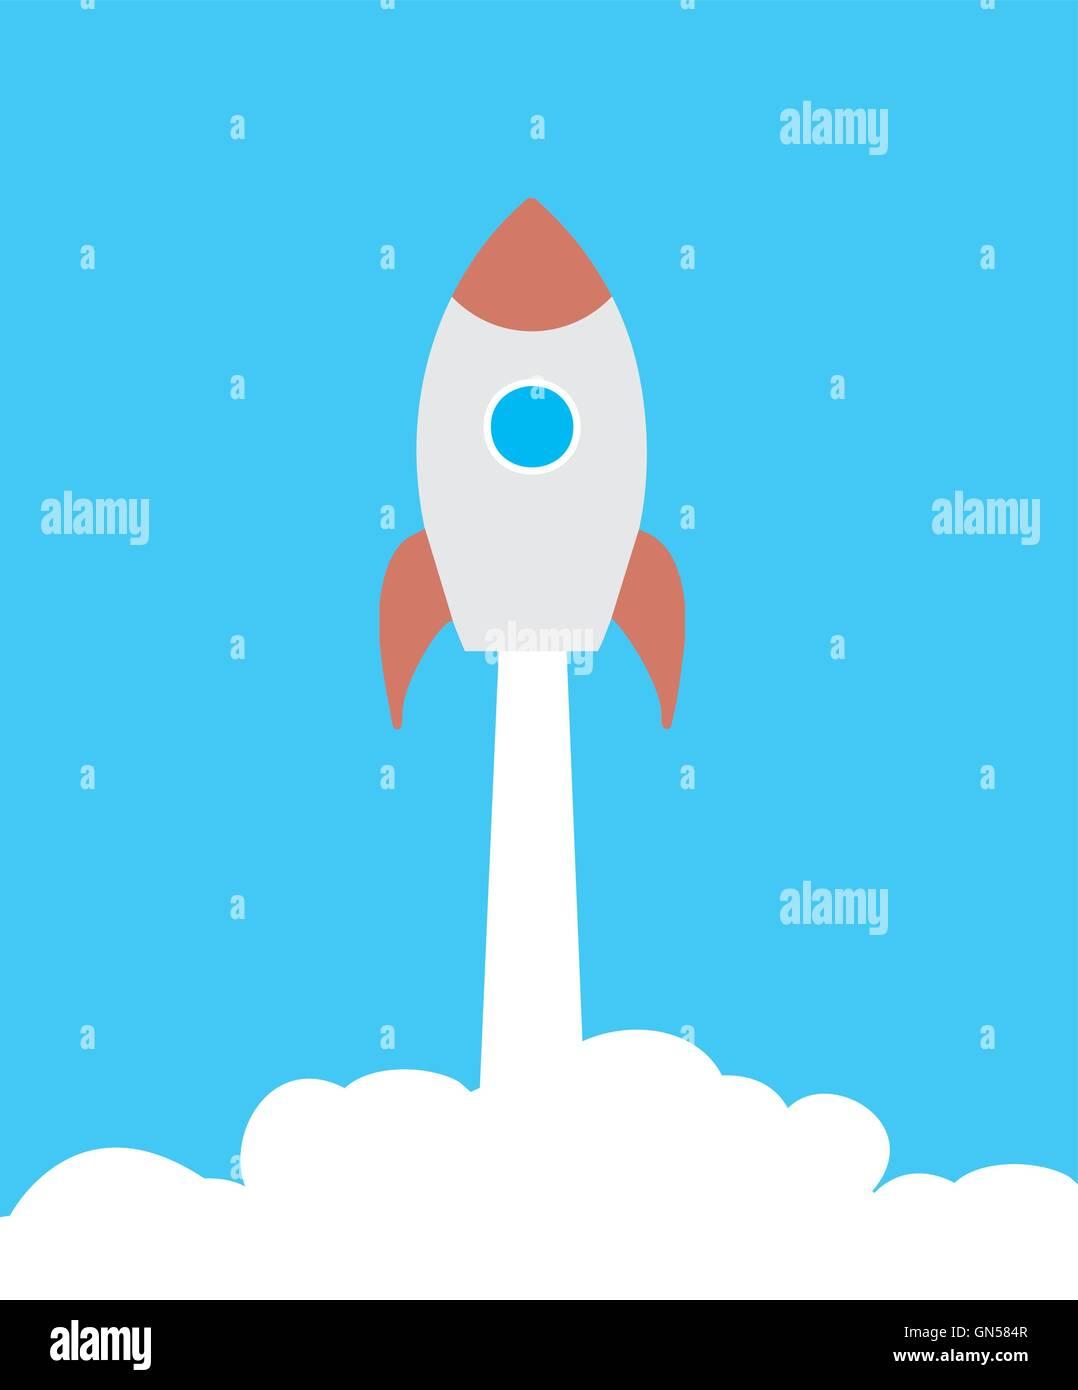 Rocket - Stock Image